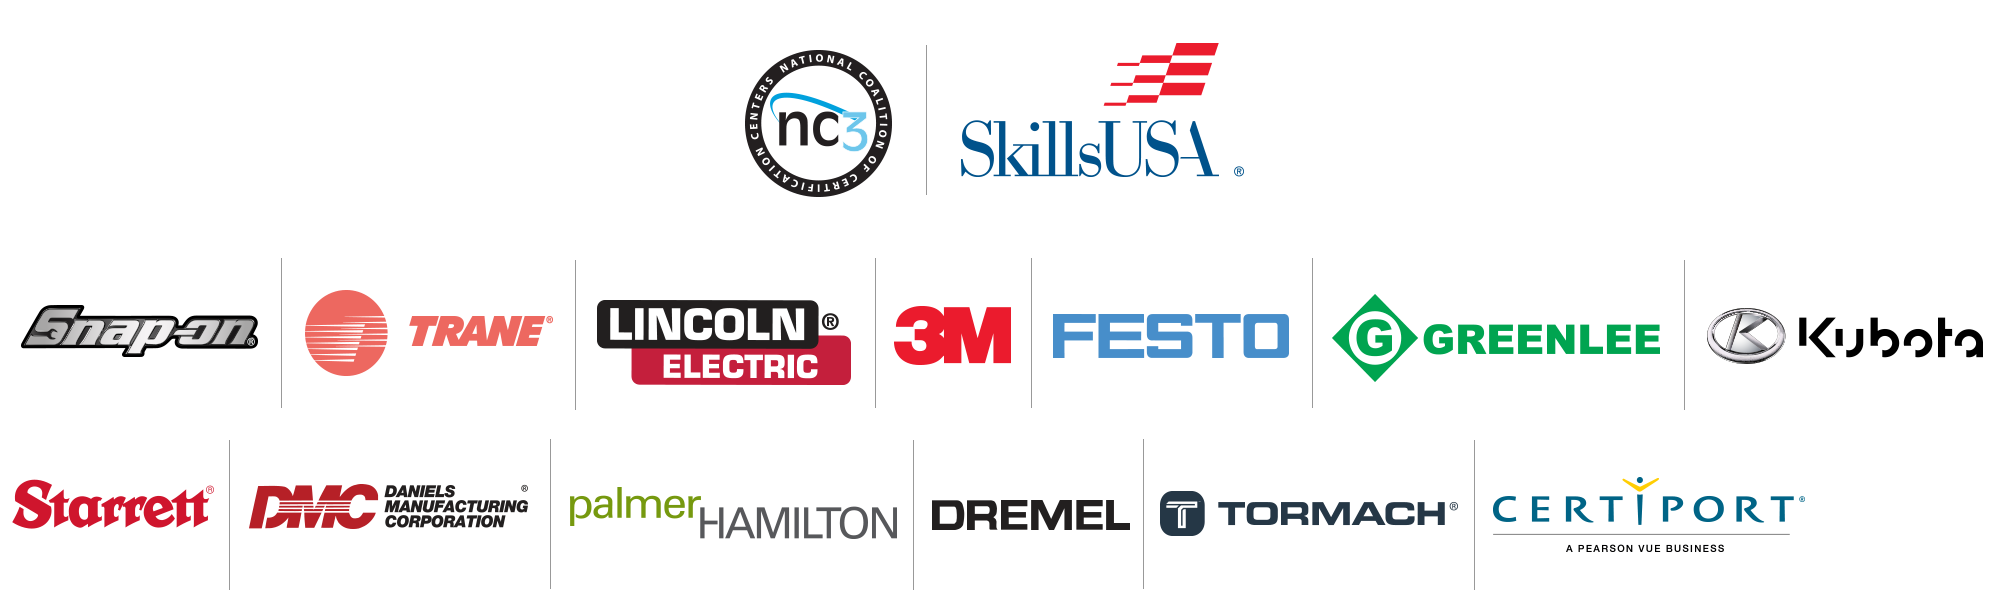 partner-logos-2020-plus-haas6